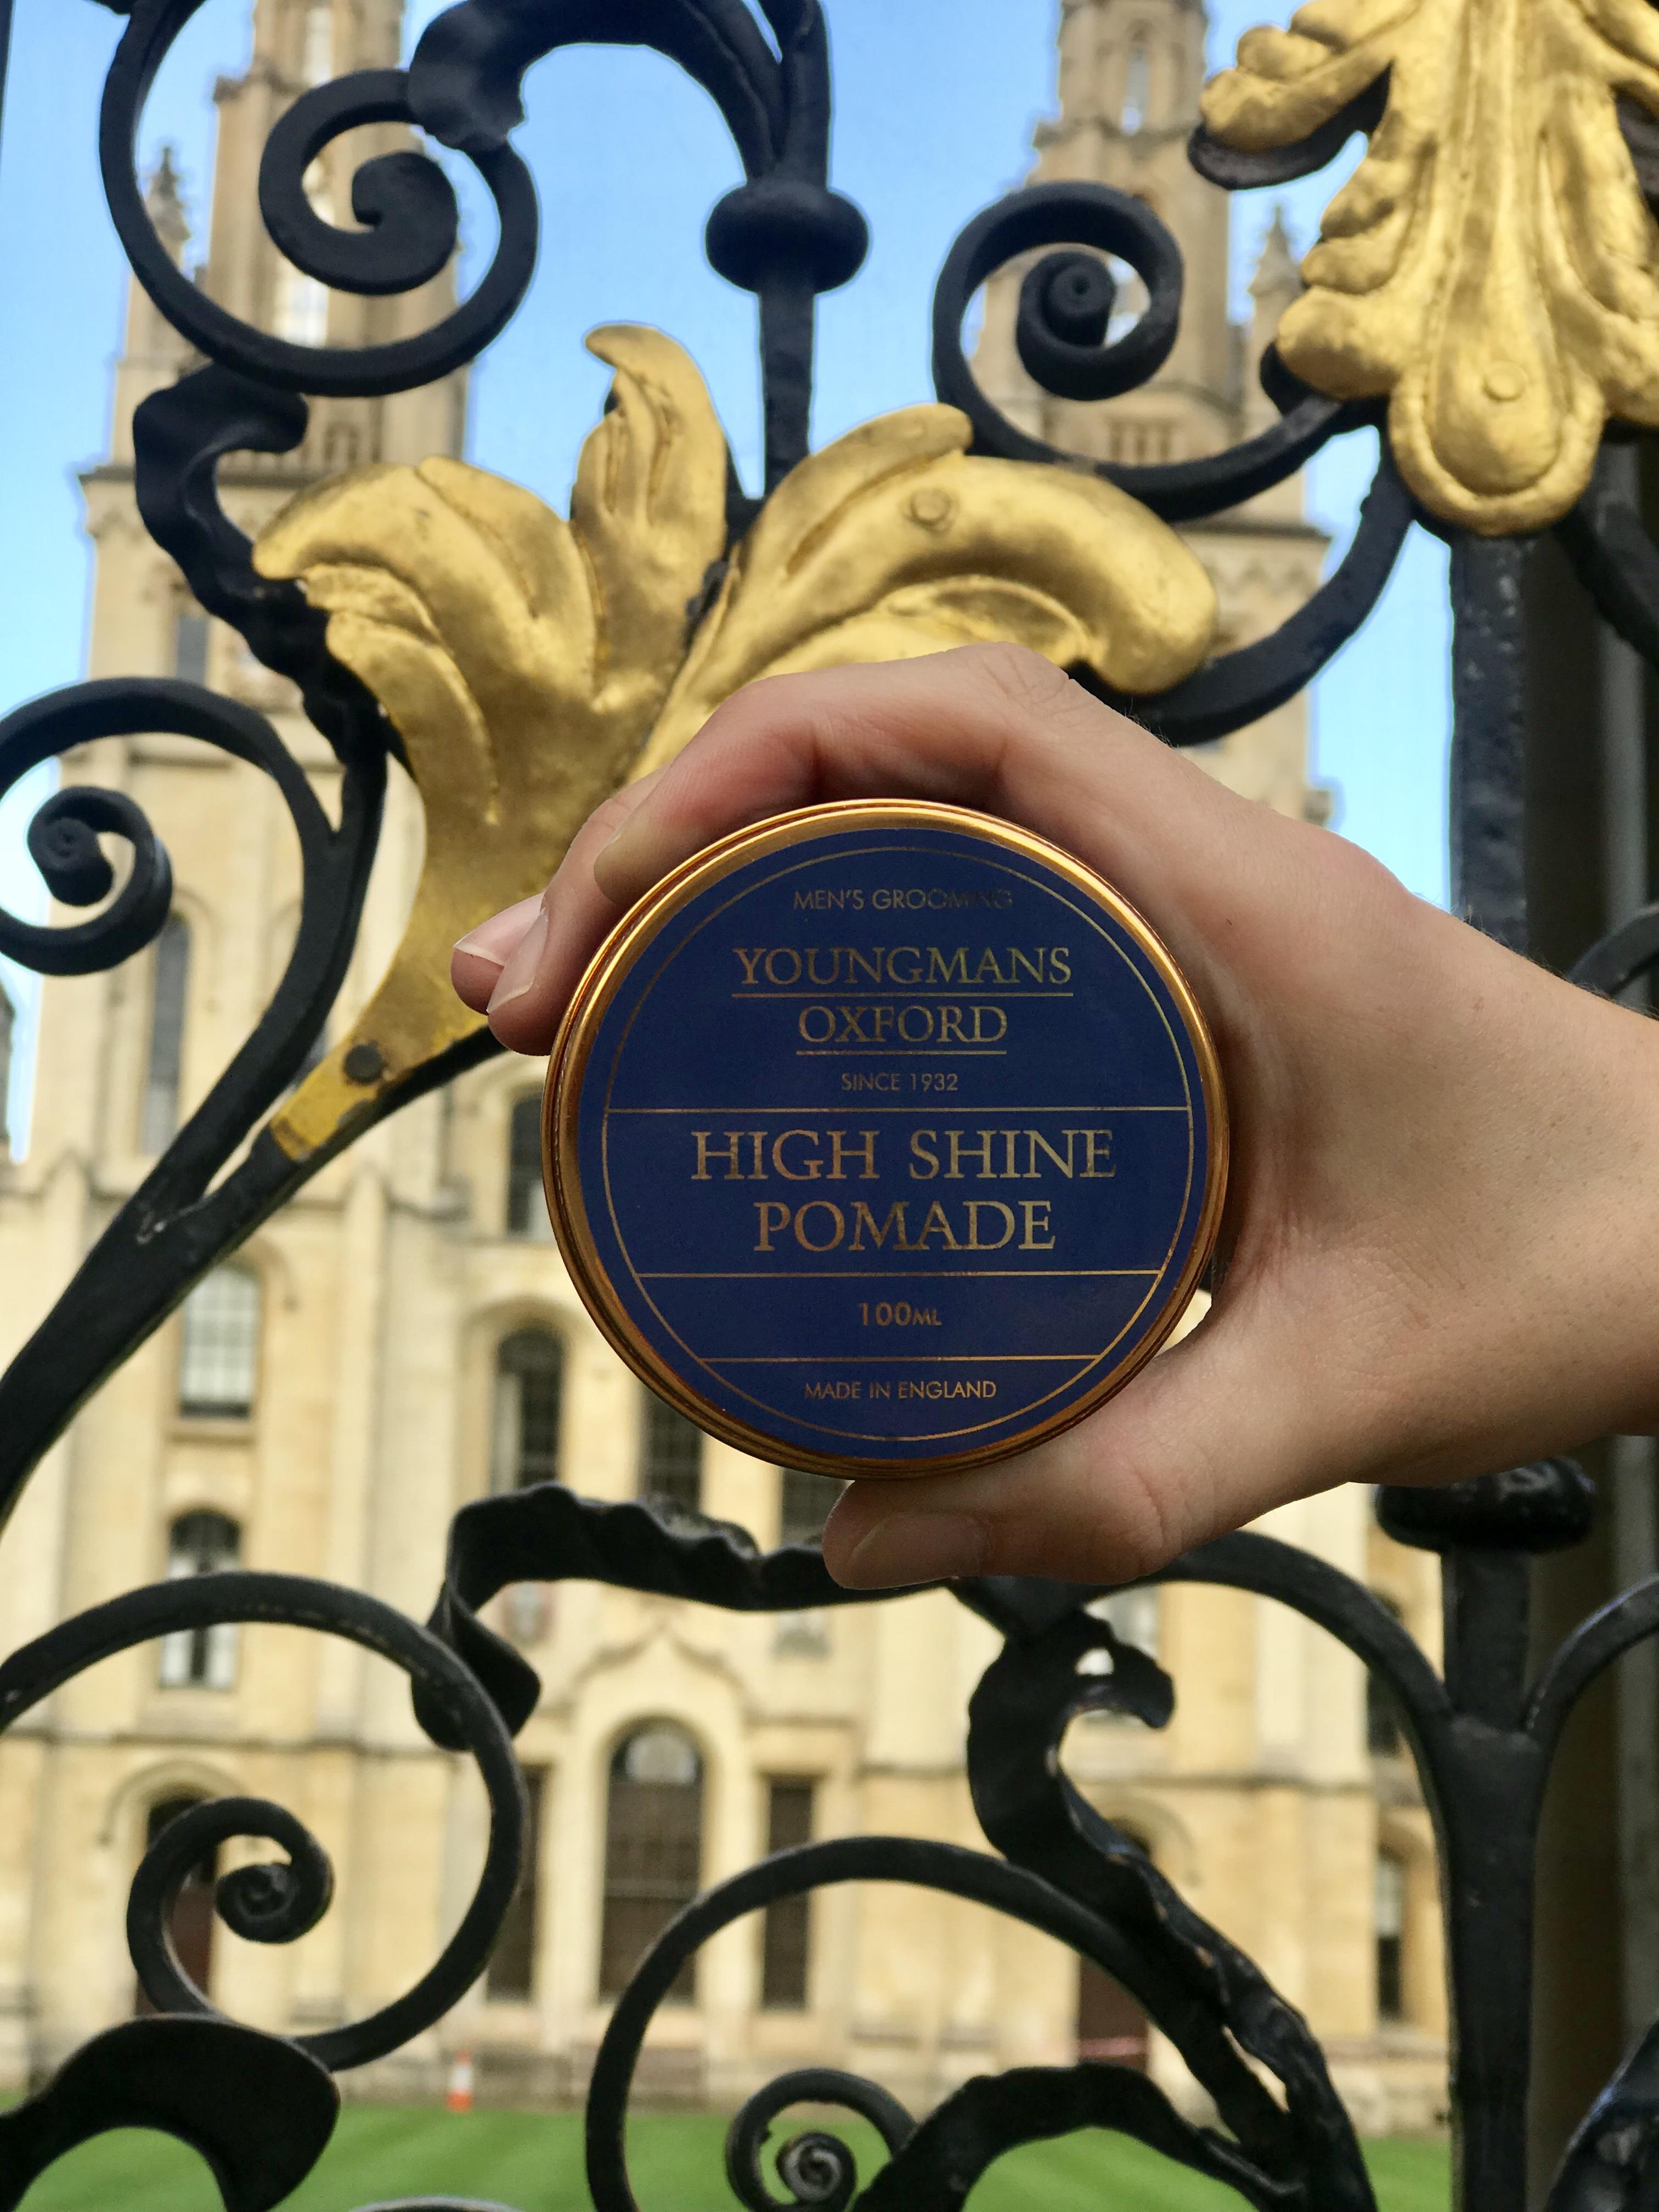 High Shine Pomade